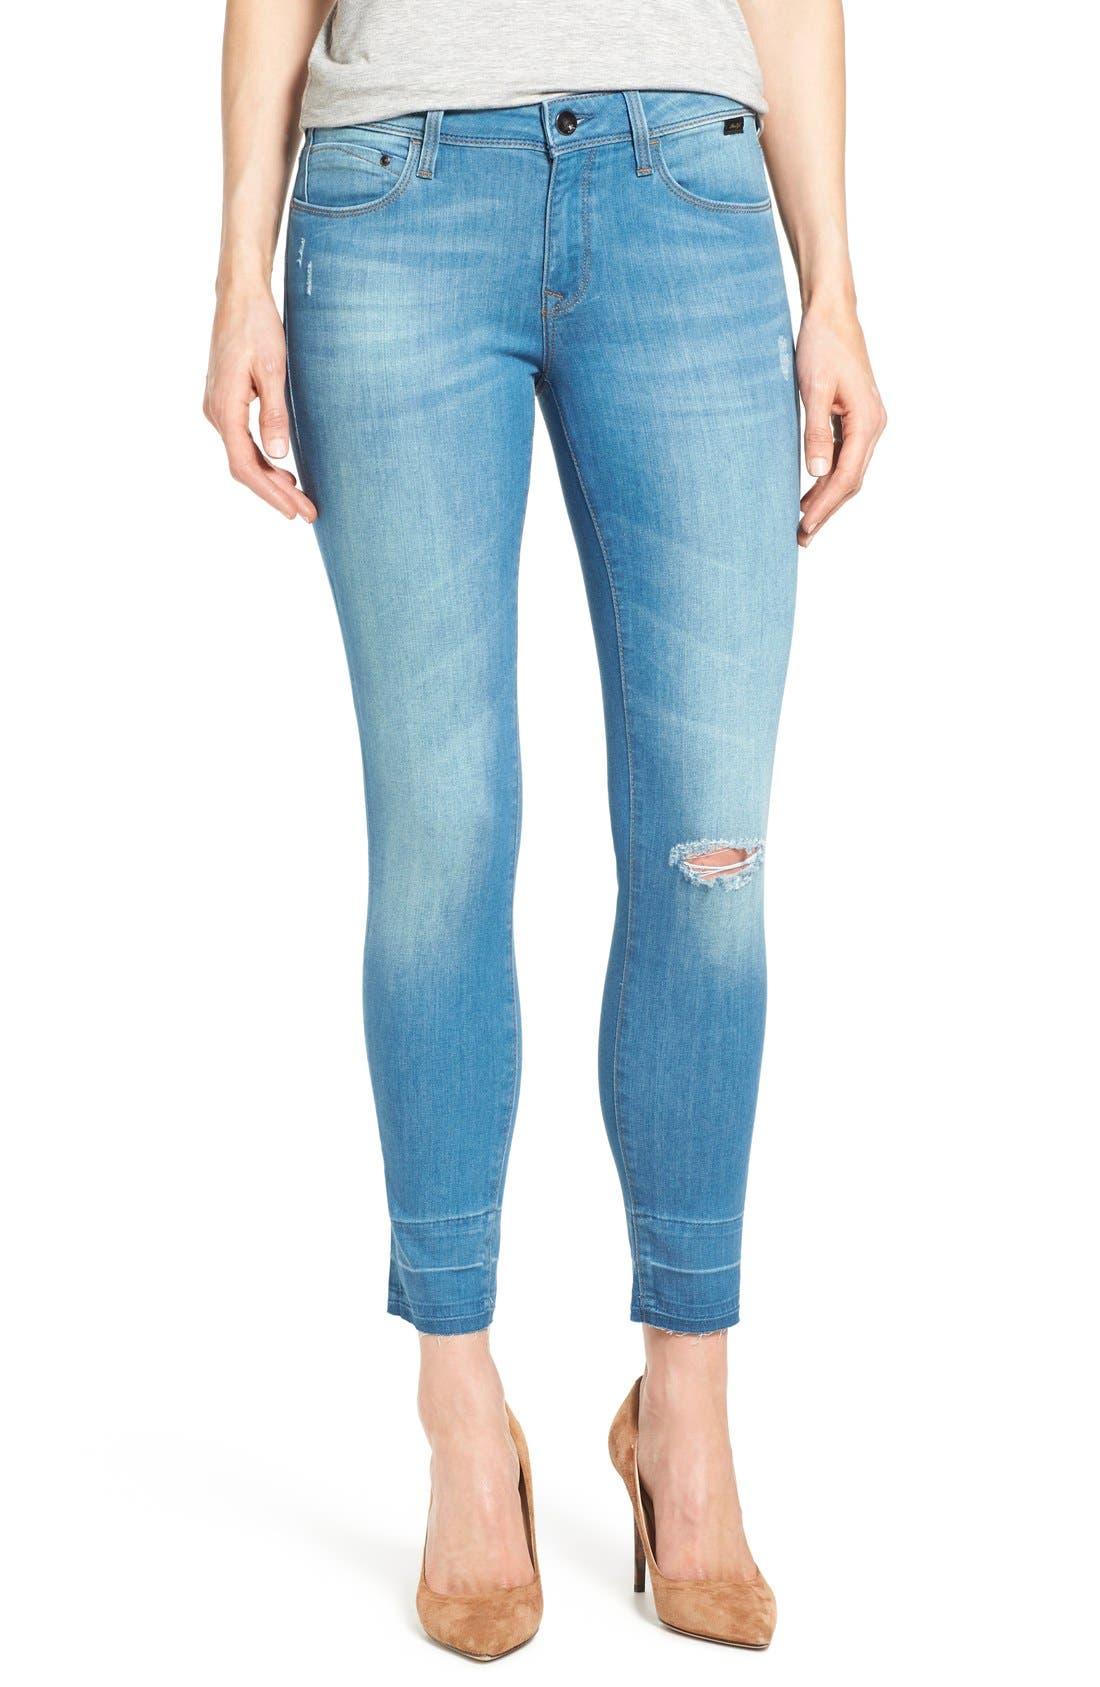 Alternate Image 1 Selected - Mavi Jeans Gold 'Alexa' Stretch Ankle Skinny Jeans